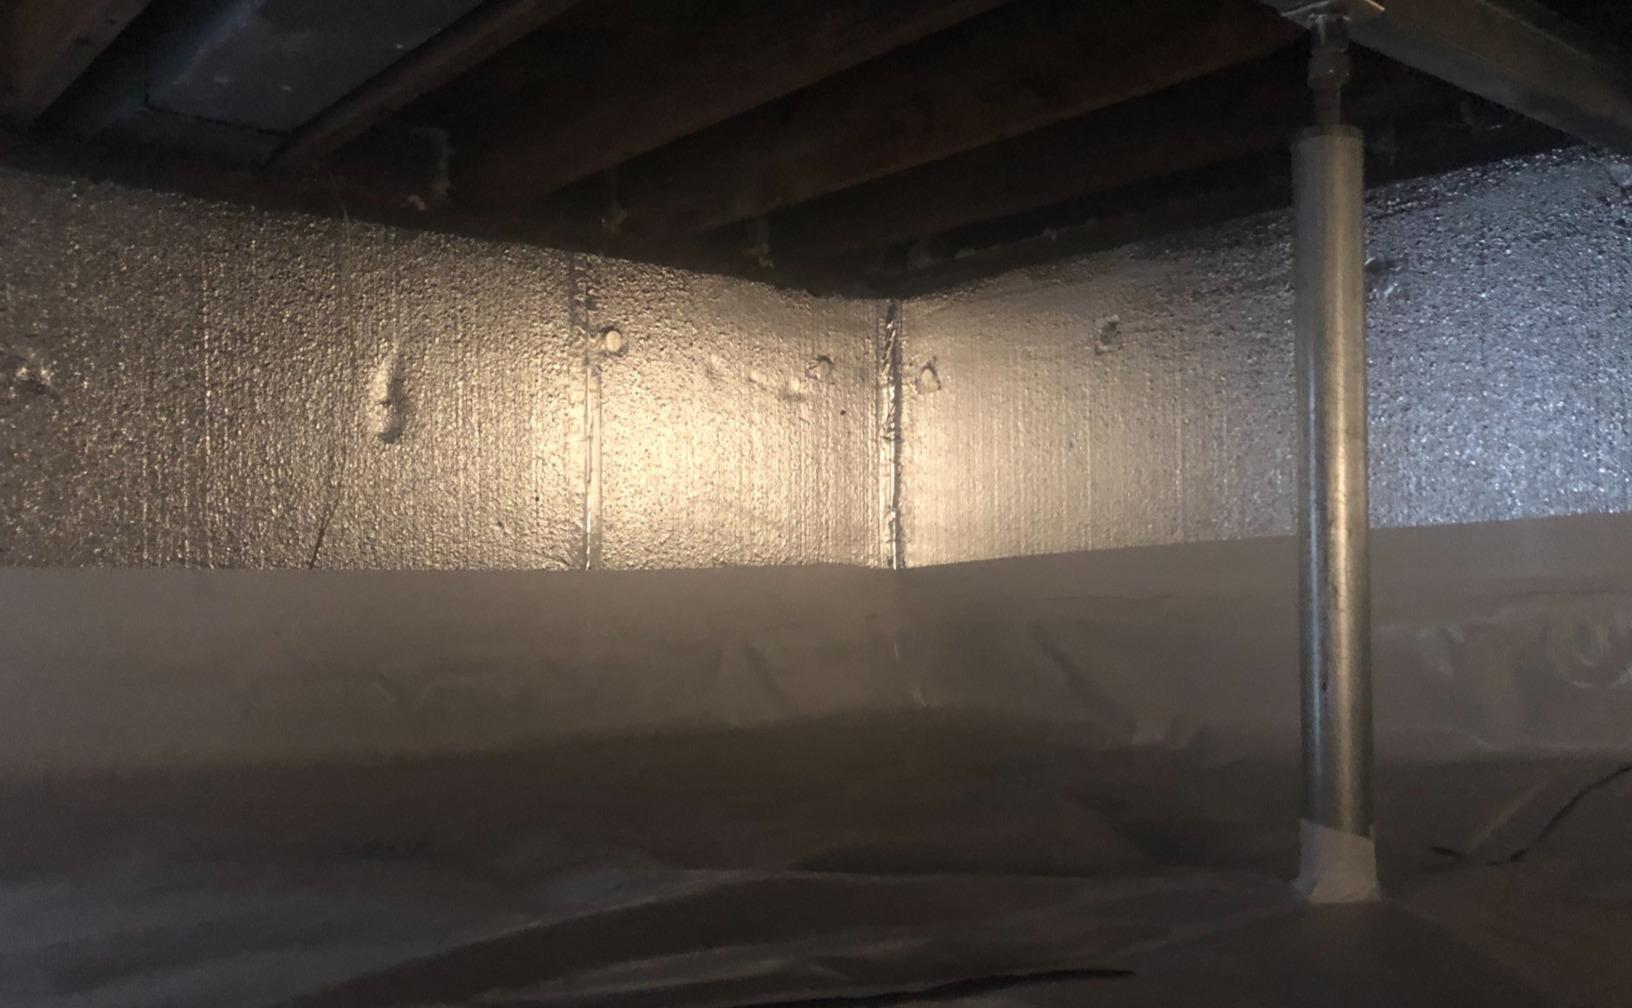 Revamped Crawlspace in Falls Church, VA - After Photo